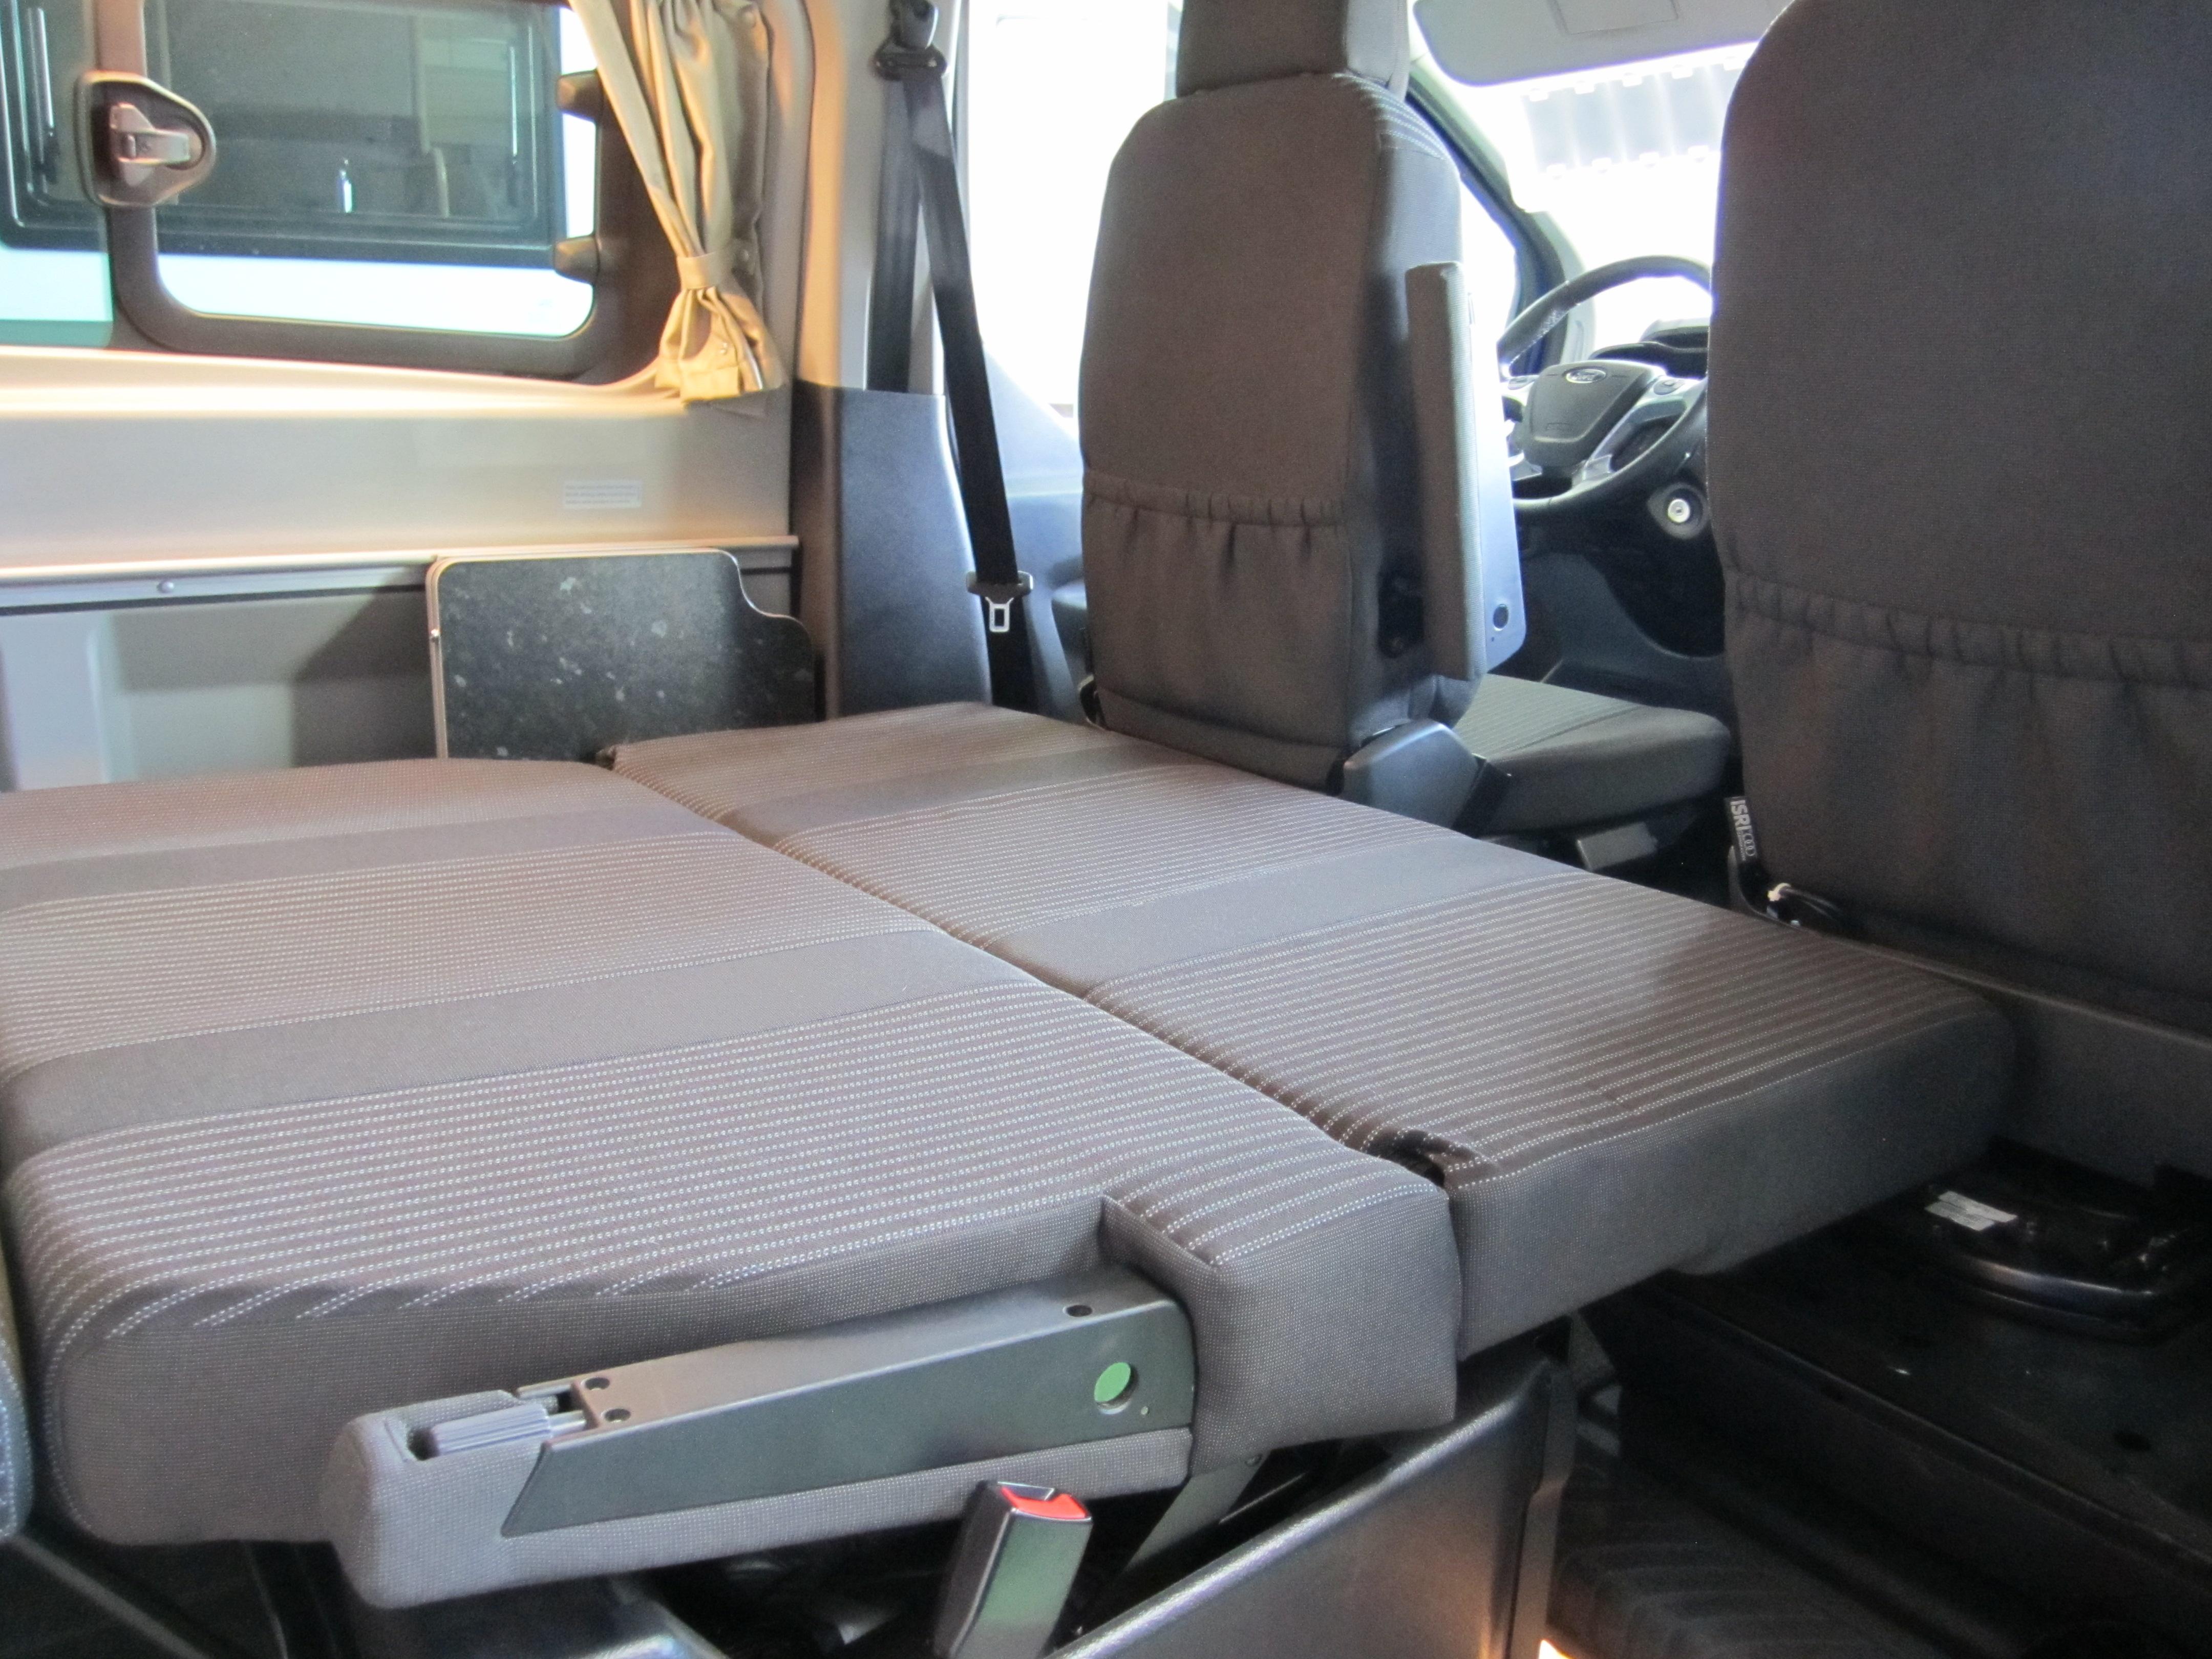 2016 Ford Westfalia Ford Nugget Campervan Blue 2 2L Diesel